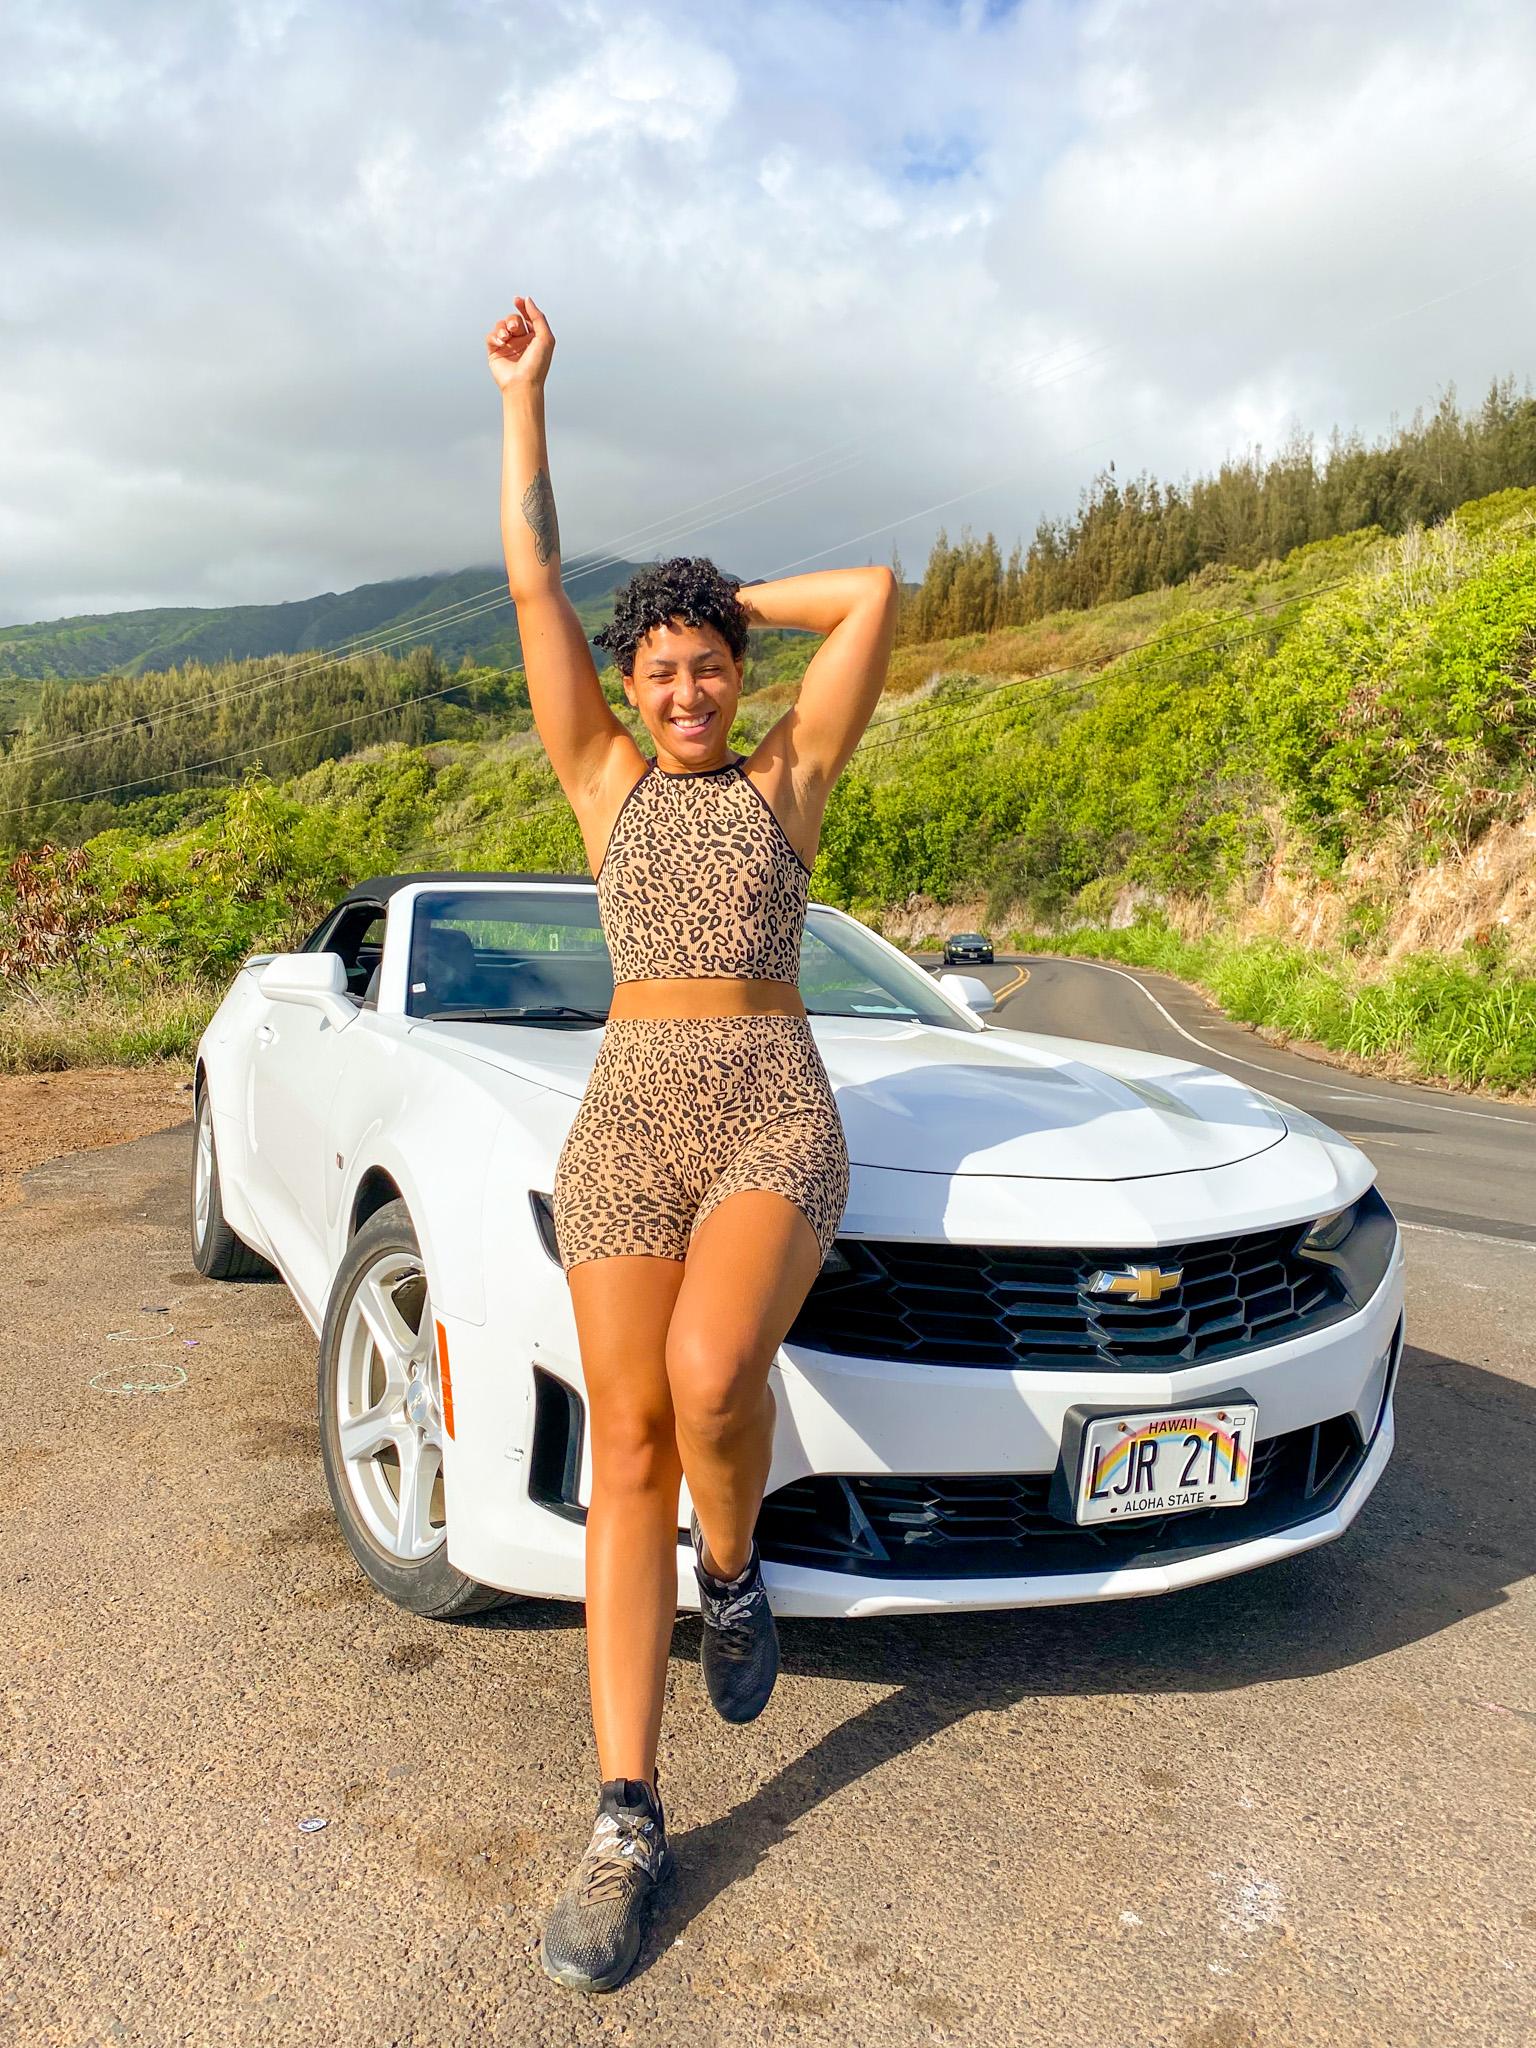 traveling to hawaii maui, car rental hawaii maui, maui covid travel, luxury travel, black girl travel guide